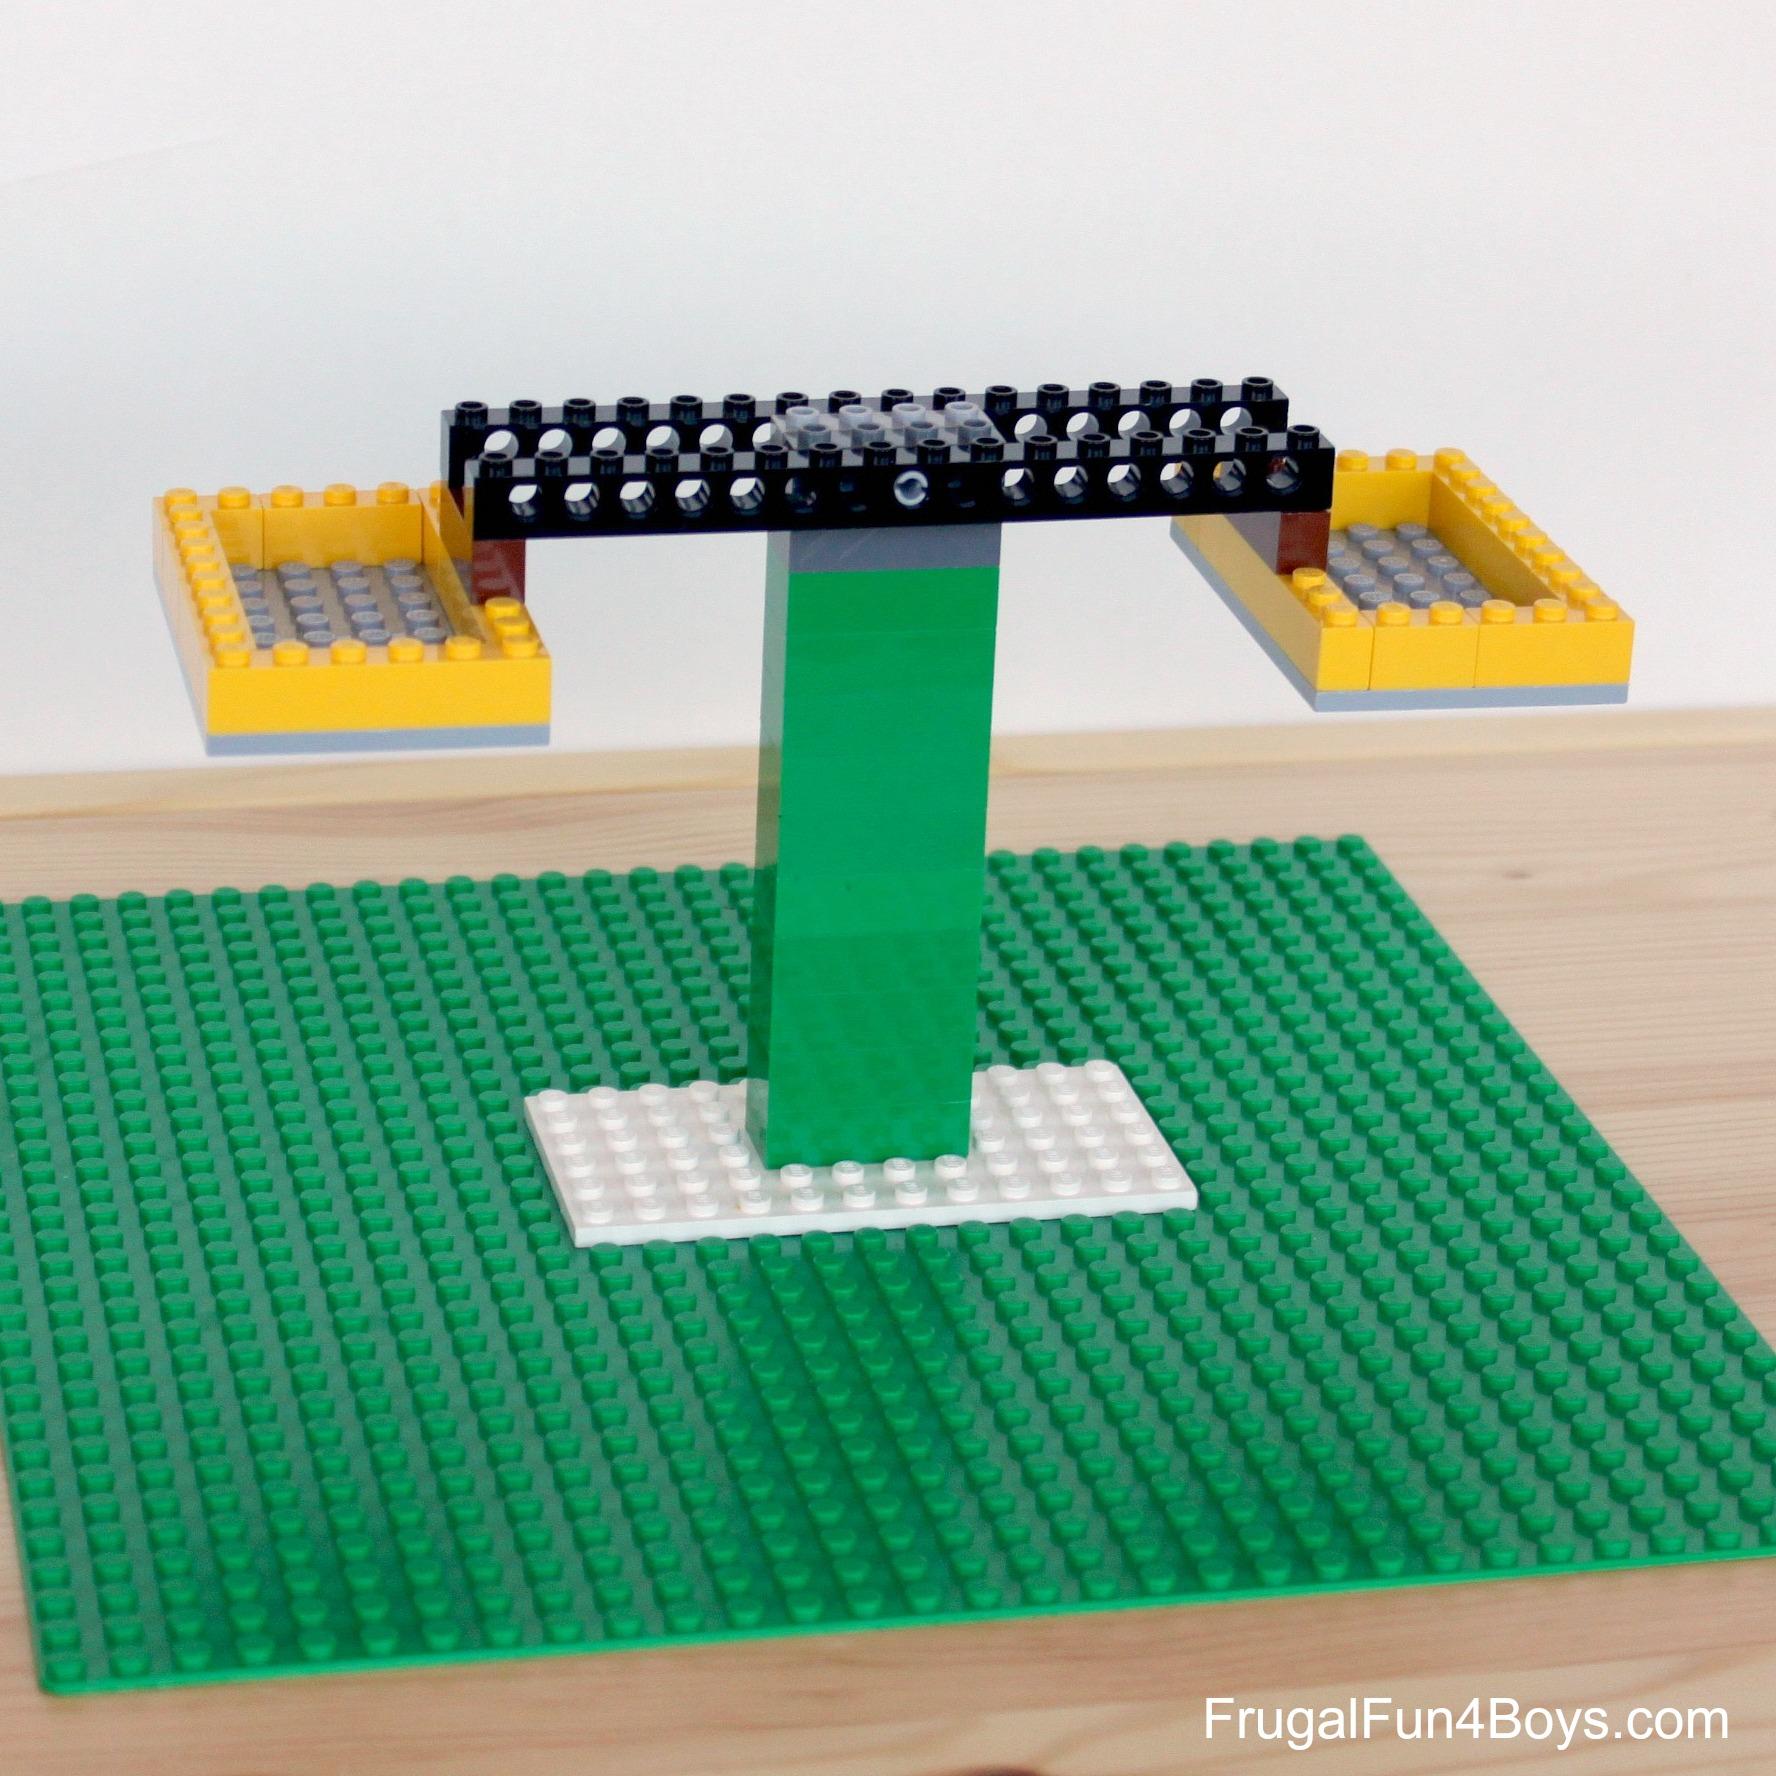 Build a LEGO Balance - Math Activity for Kids